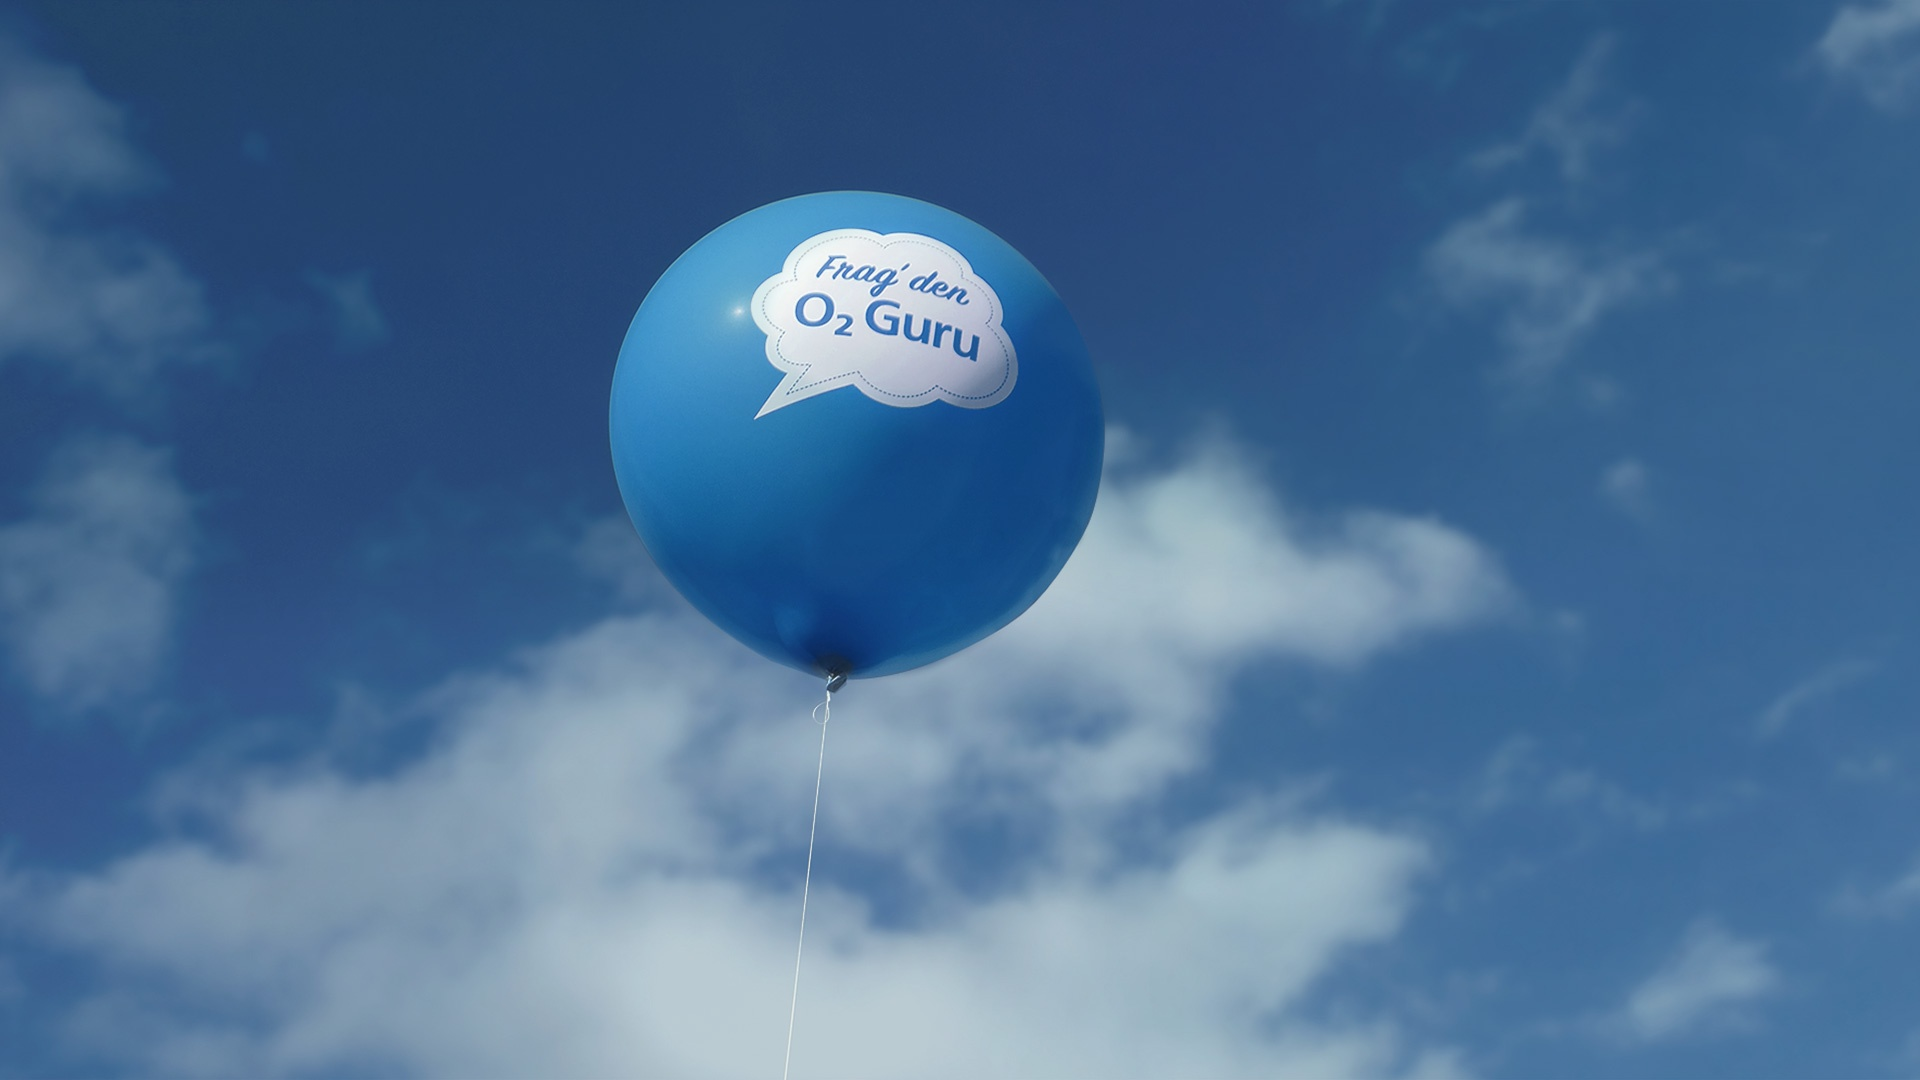 o2_guru_tour Luftballon